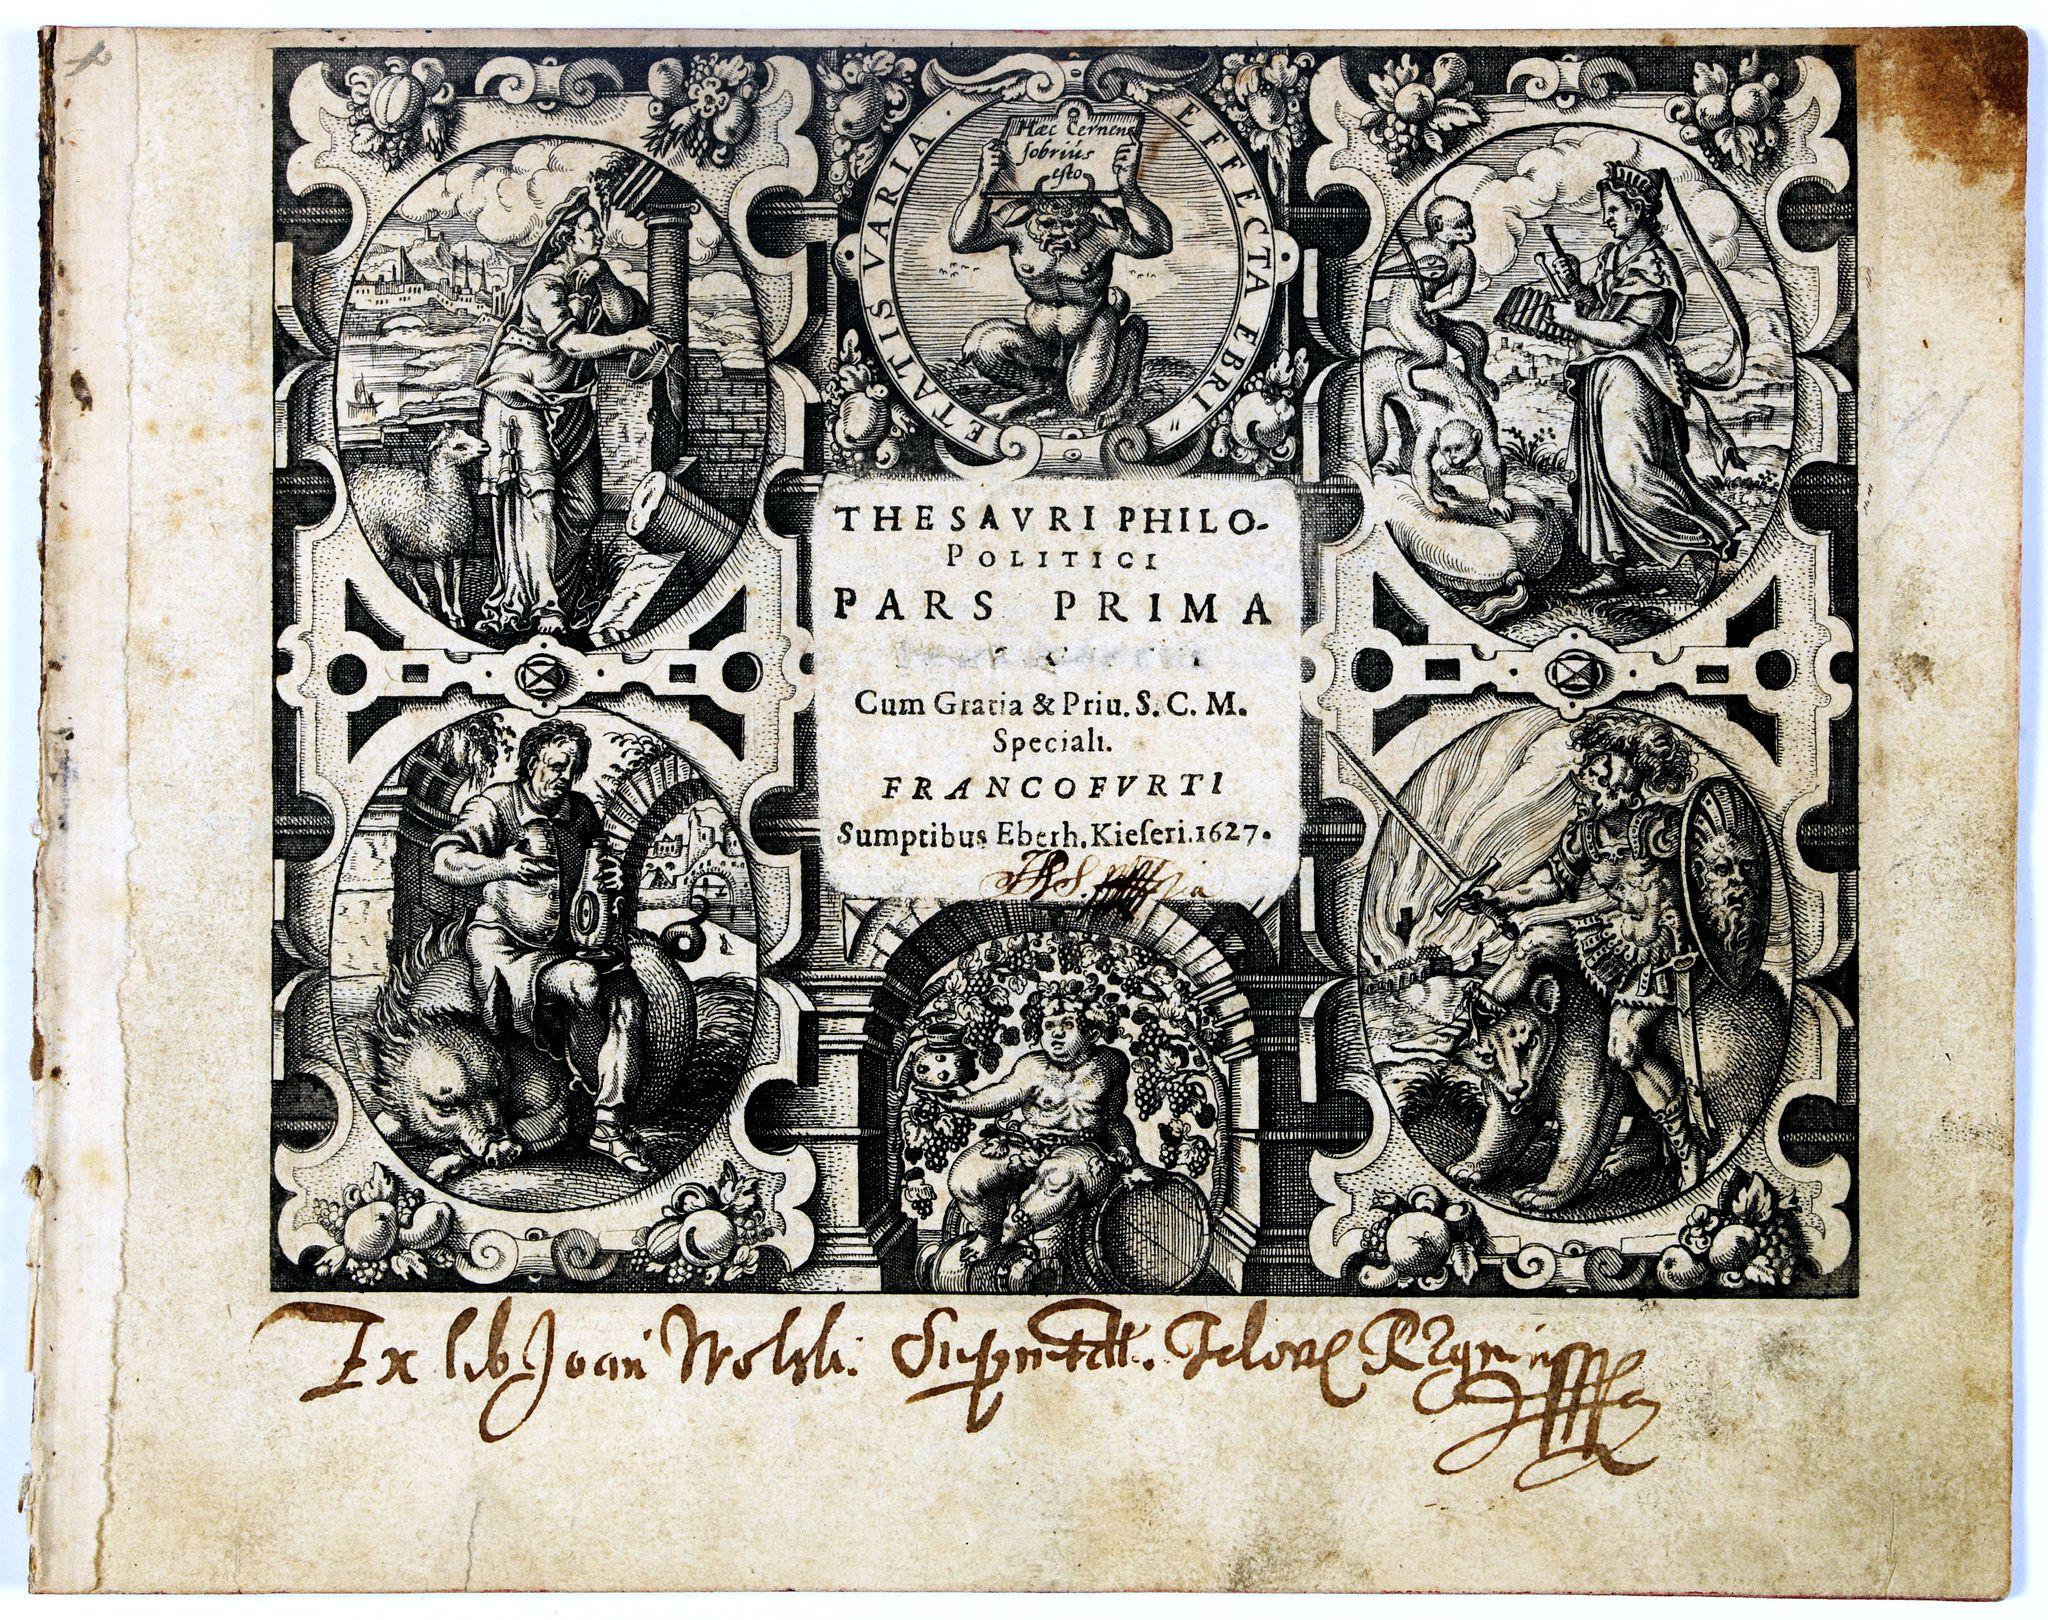 MEISNER, D. -  [Title page] Thesauri Philo Politici pars Prima …